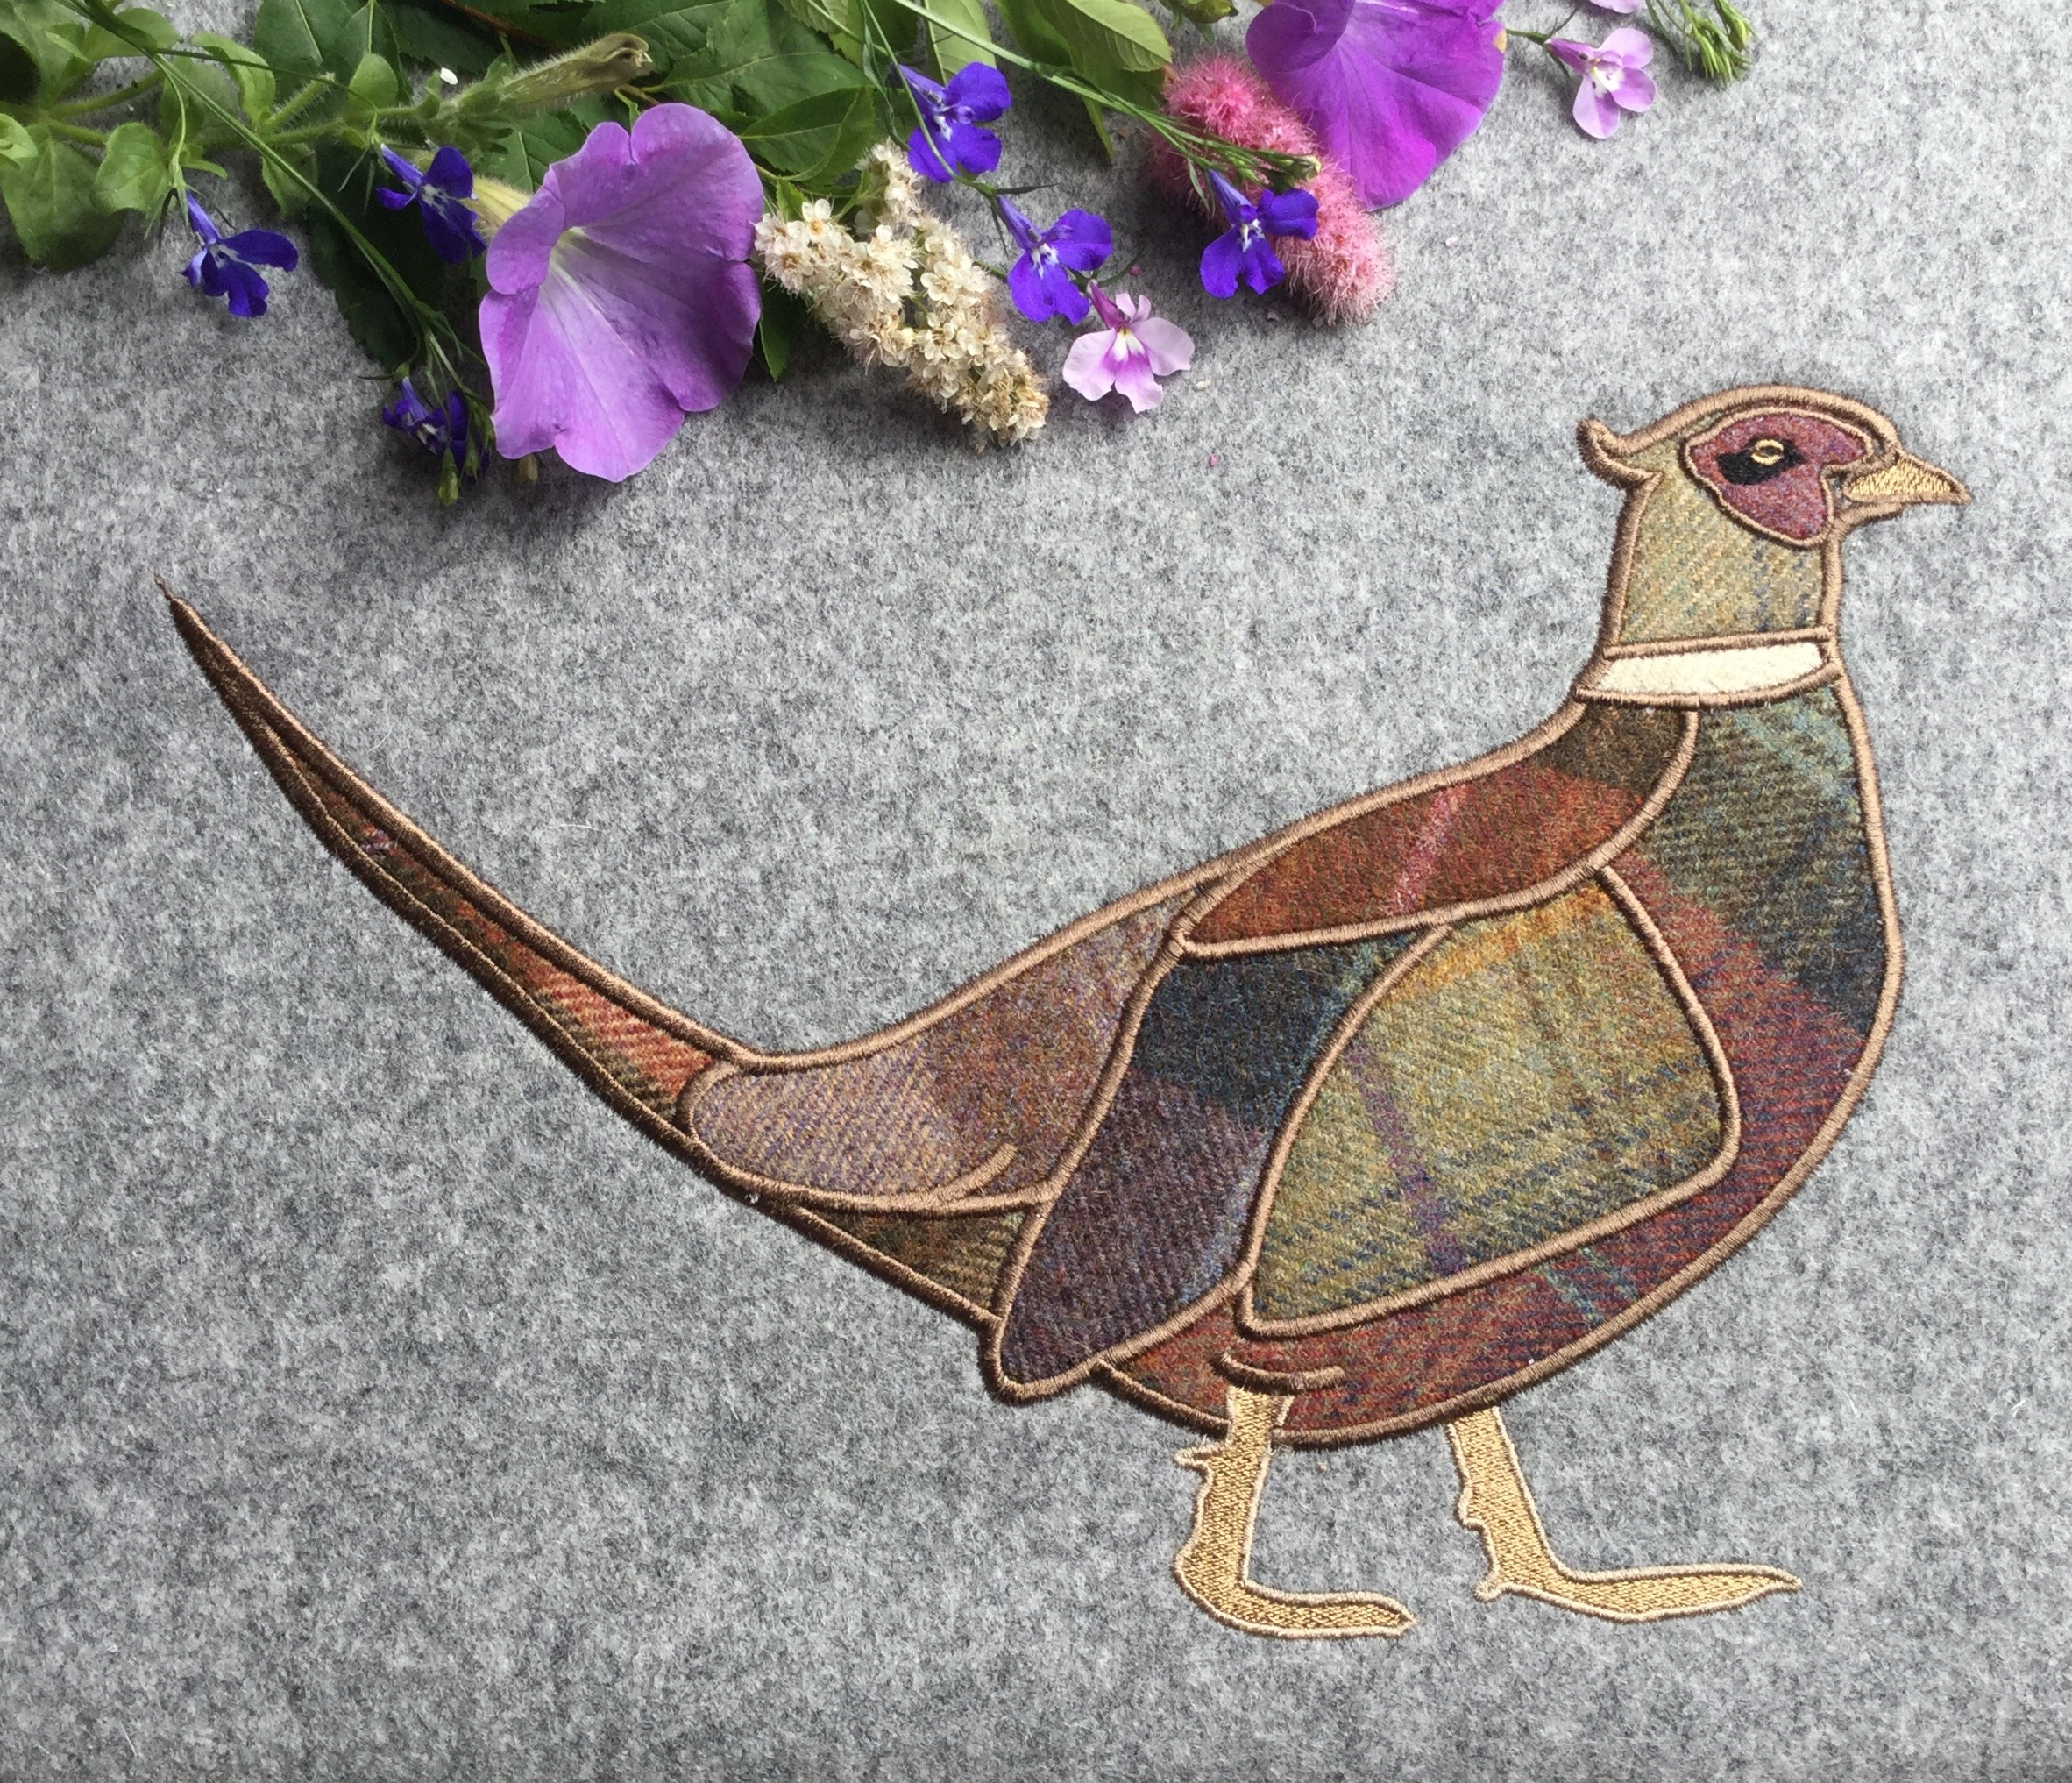 pheasant_edited